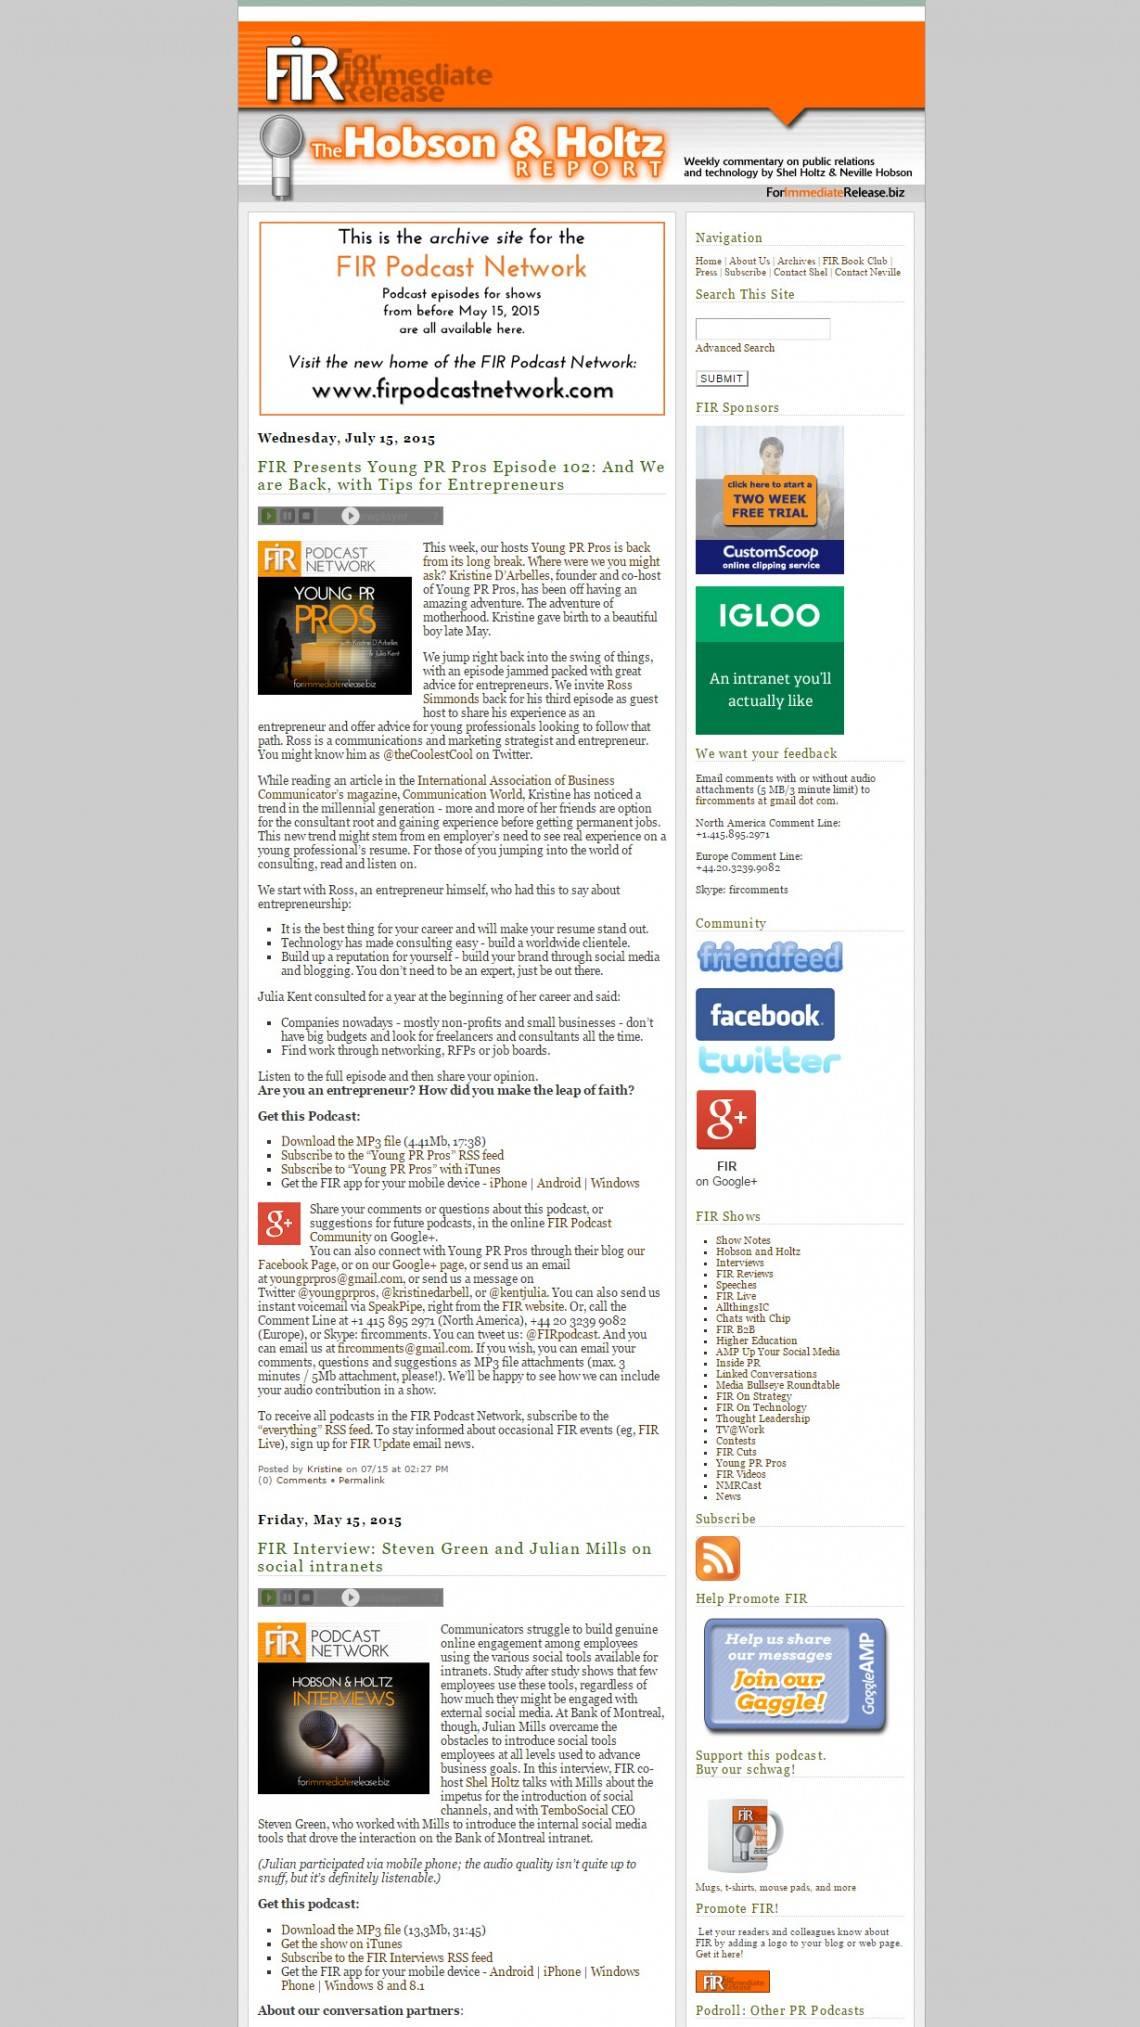 Original forimmediaterelease.biz site built in Expression Engine